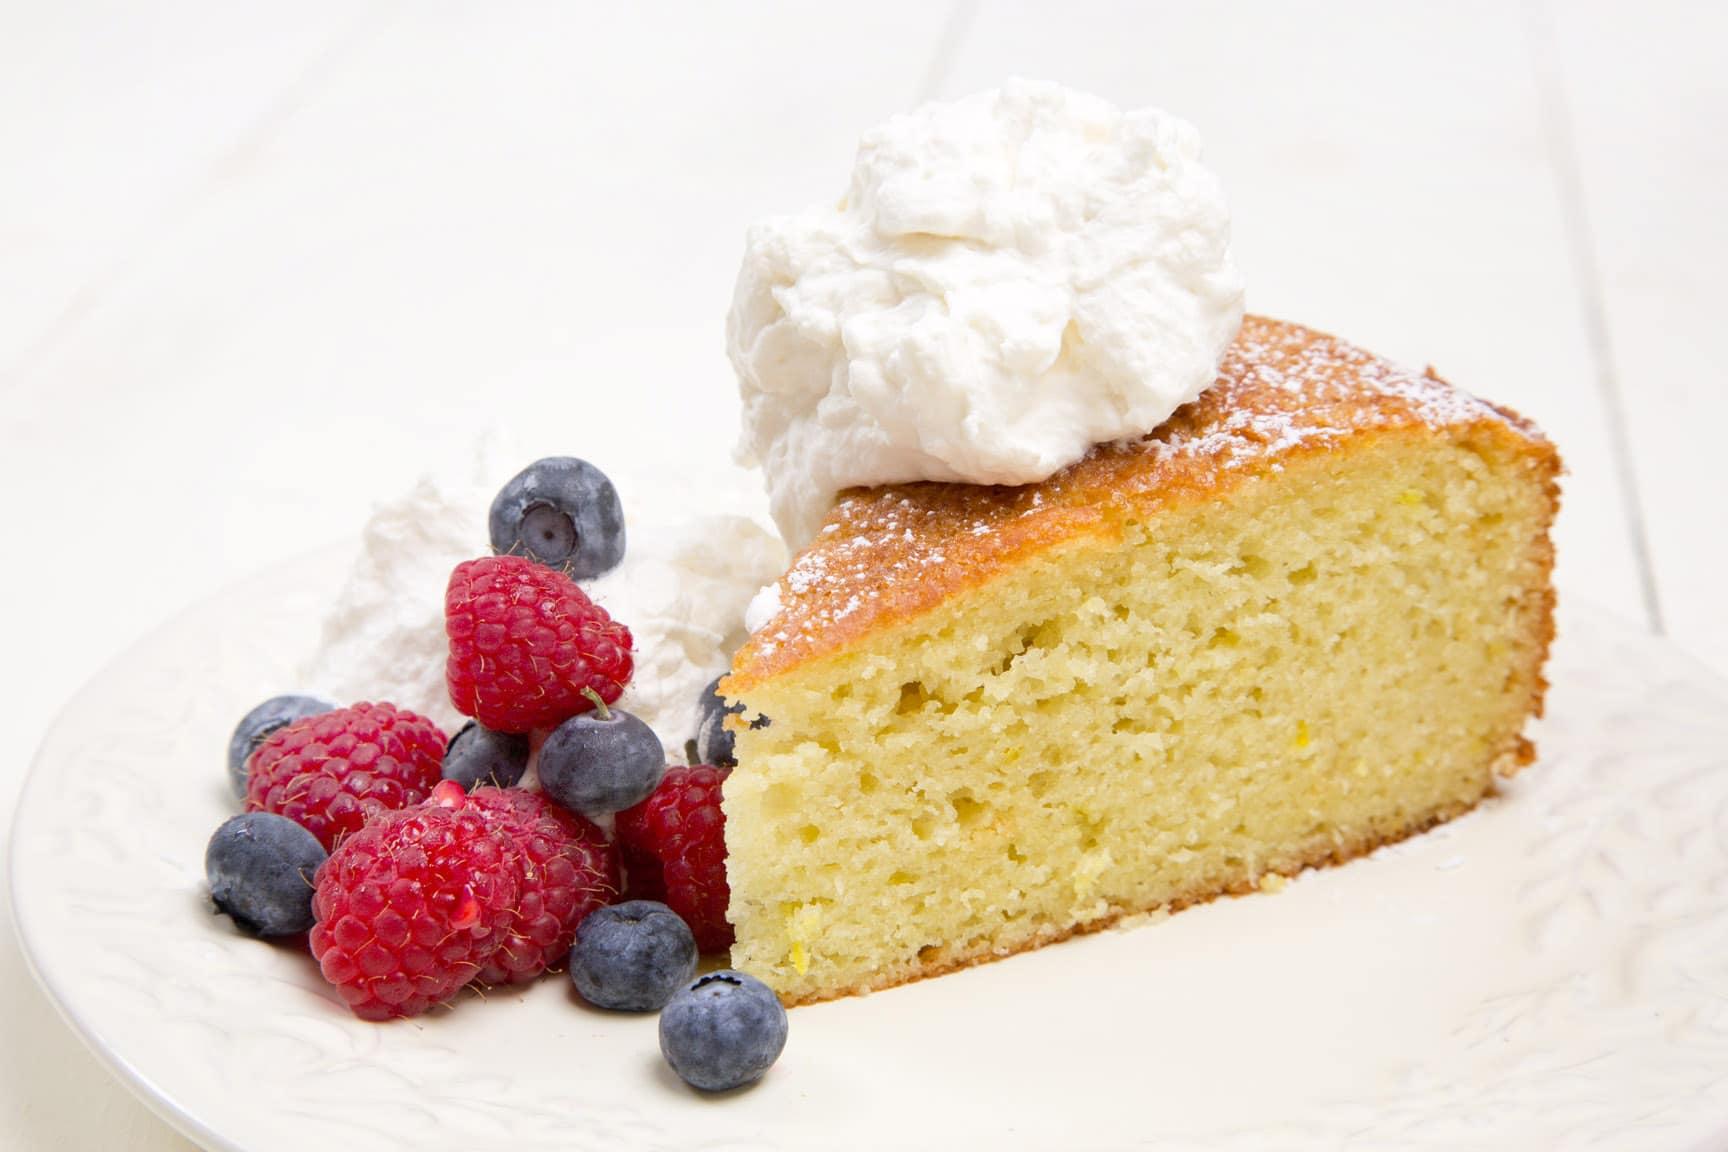 Orange Yogurt Cake Recipe perfect for breakfast or dessert